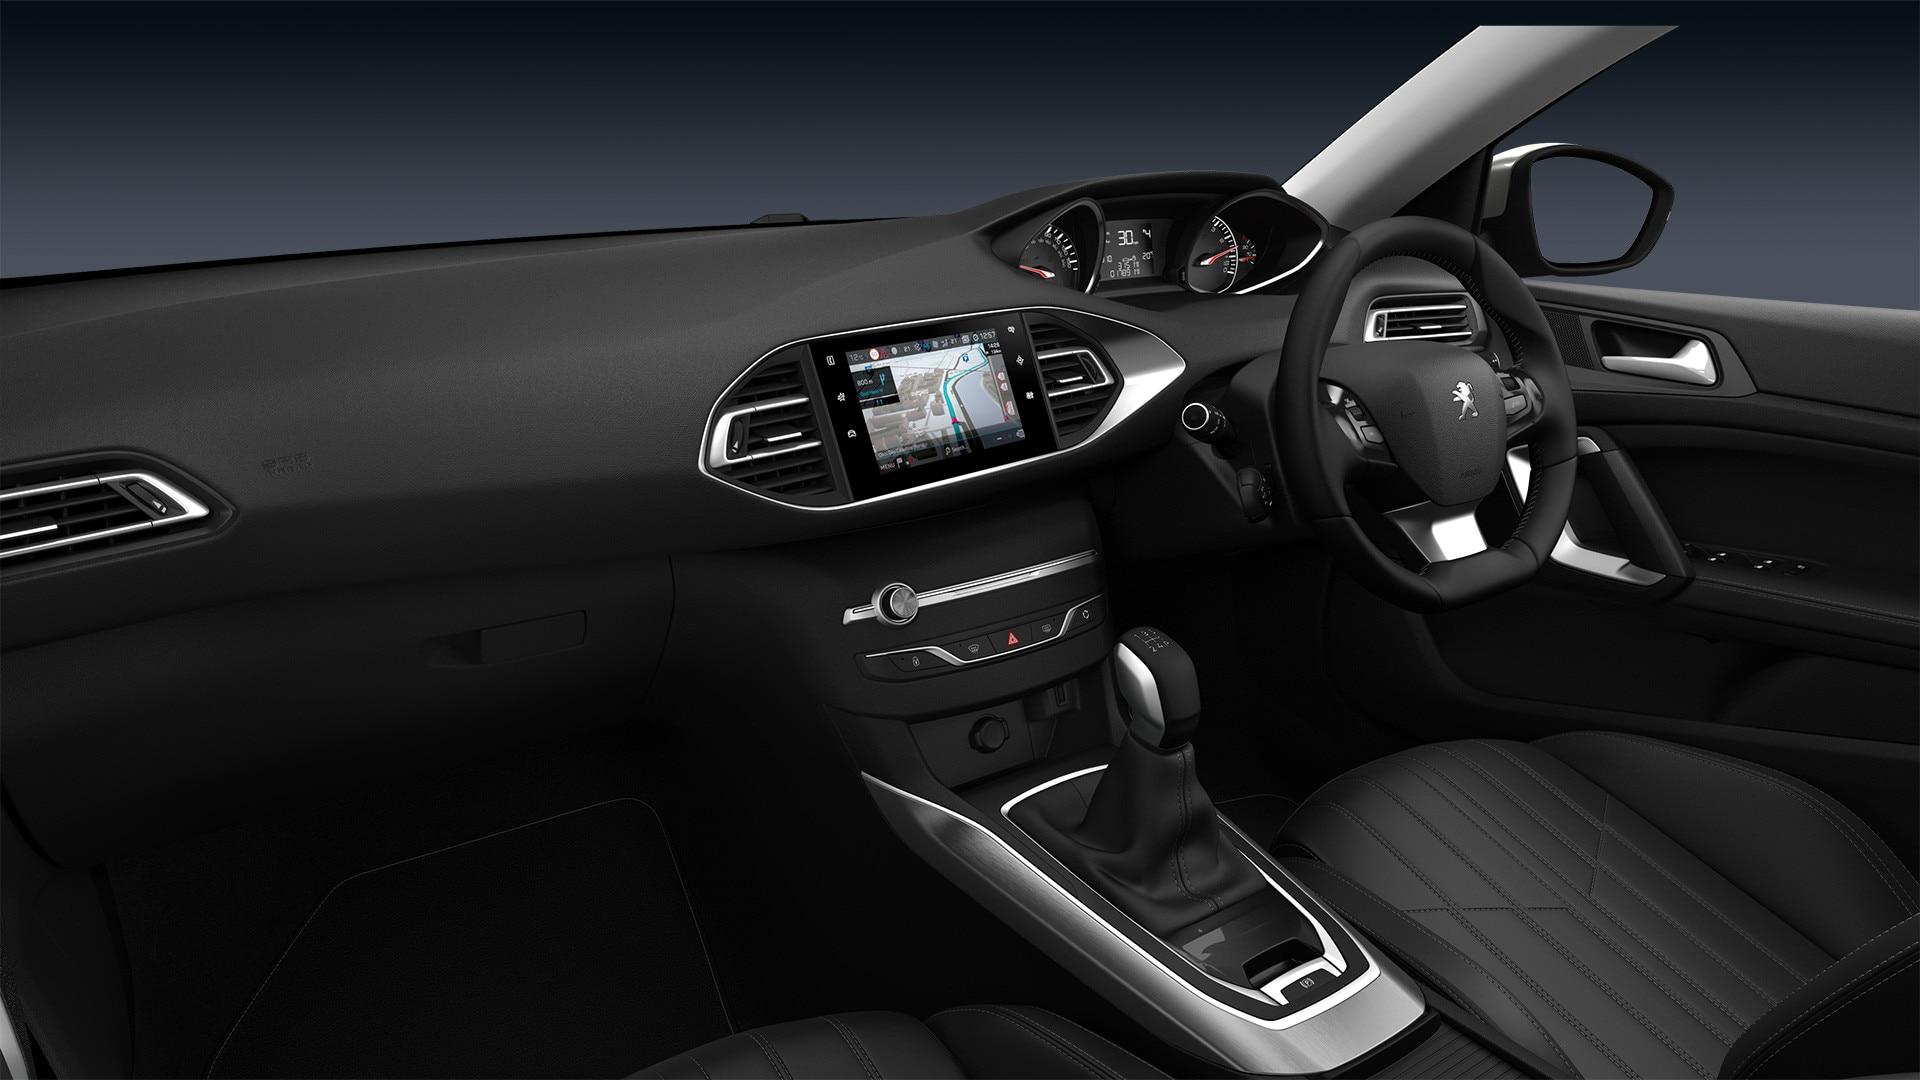 PEUGEOT 308 New Car Showroom   Hatchback   Test Drive Today